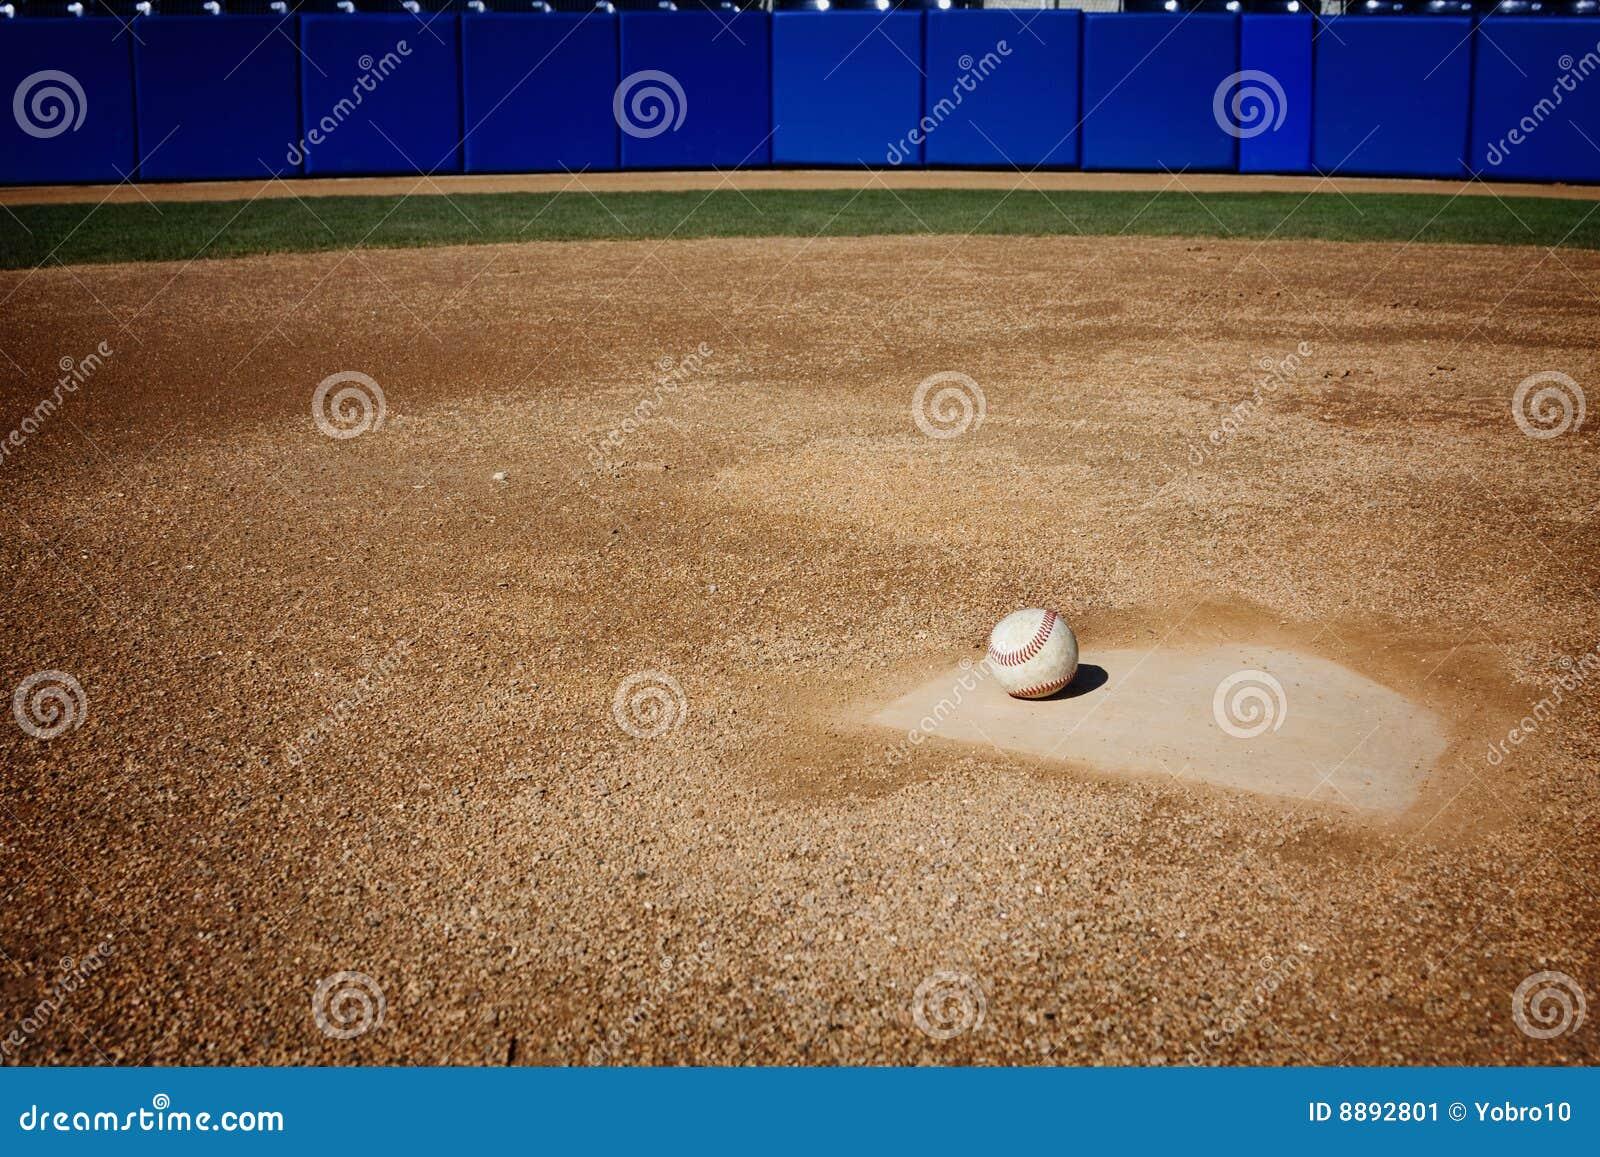 baseball field background stock image